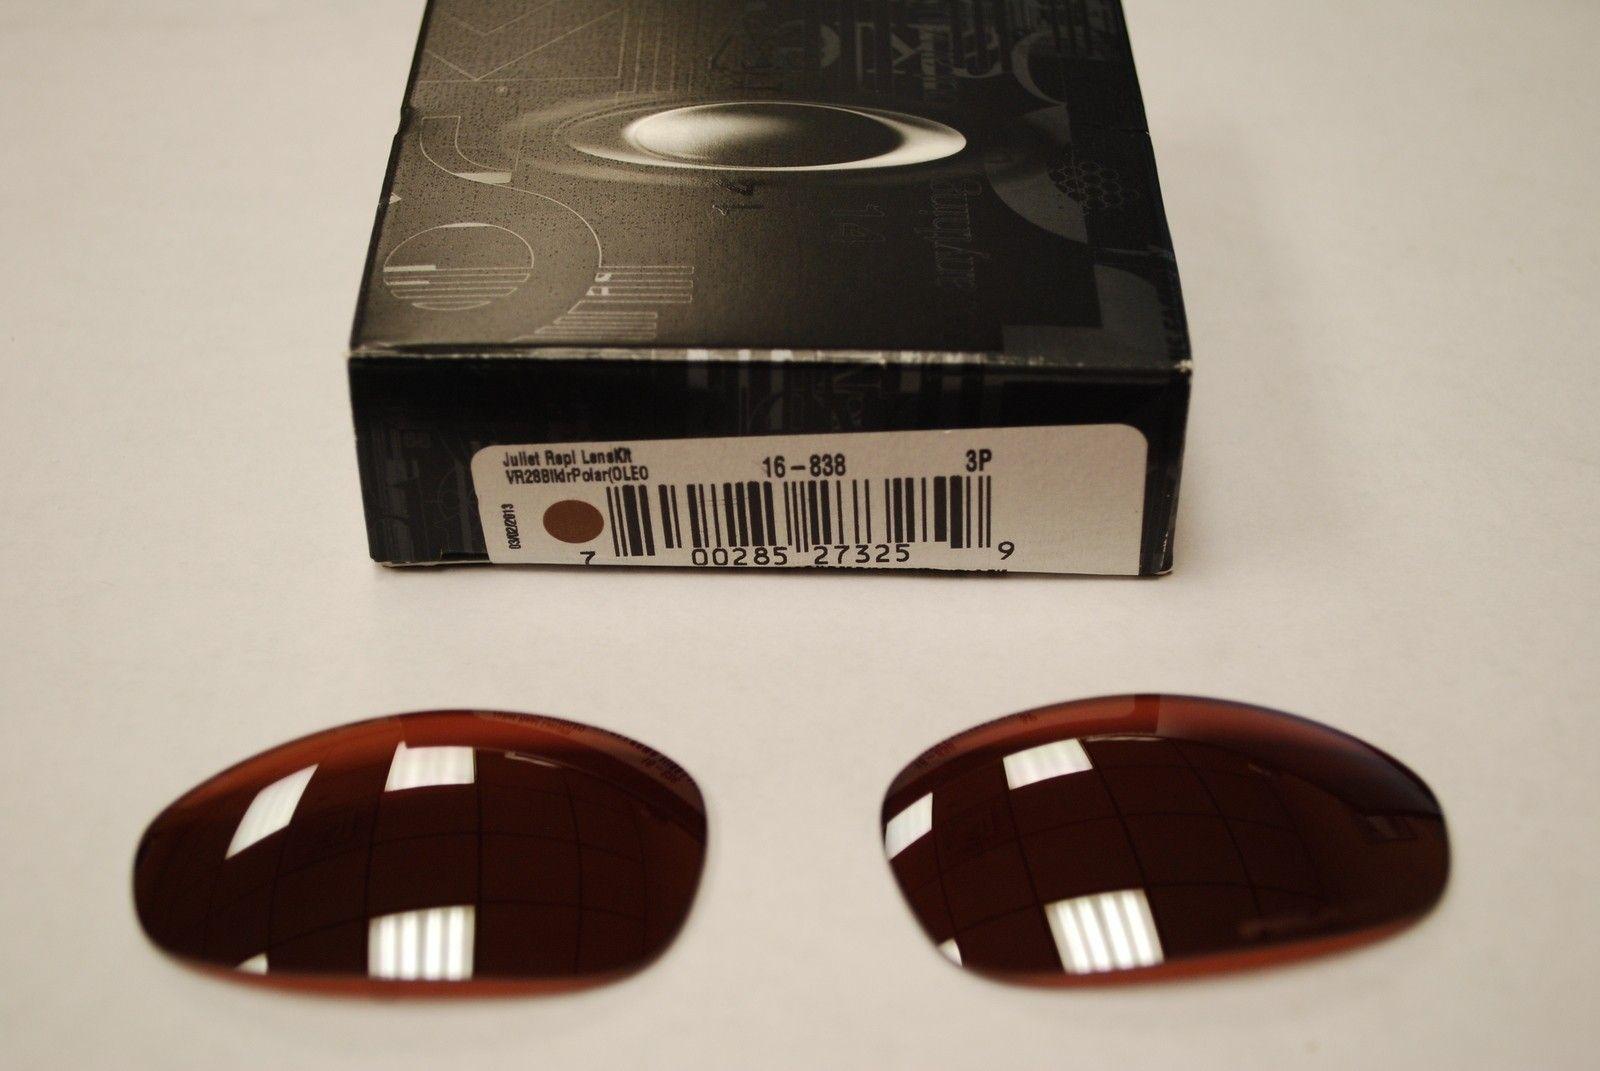 Lenses and rubbers, Ducati, Penny VR28 & more - DSC_0706.JPG